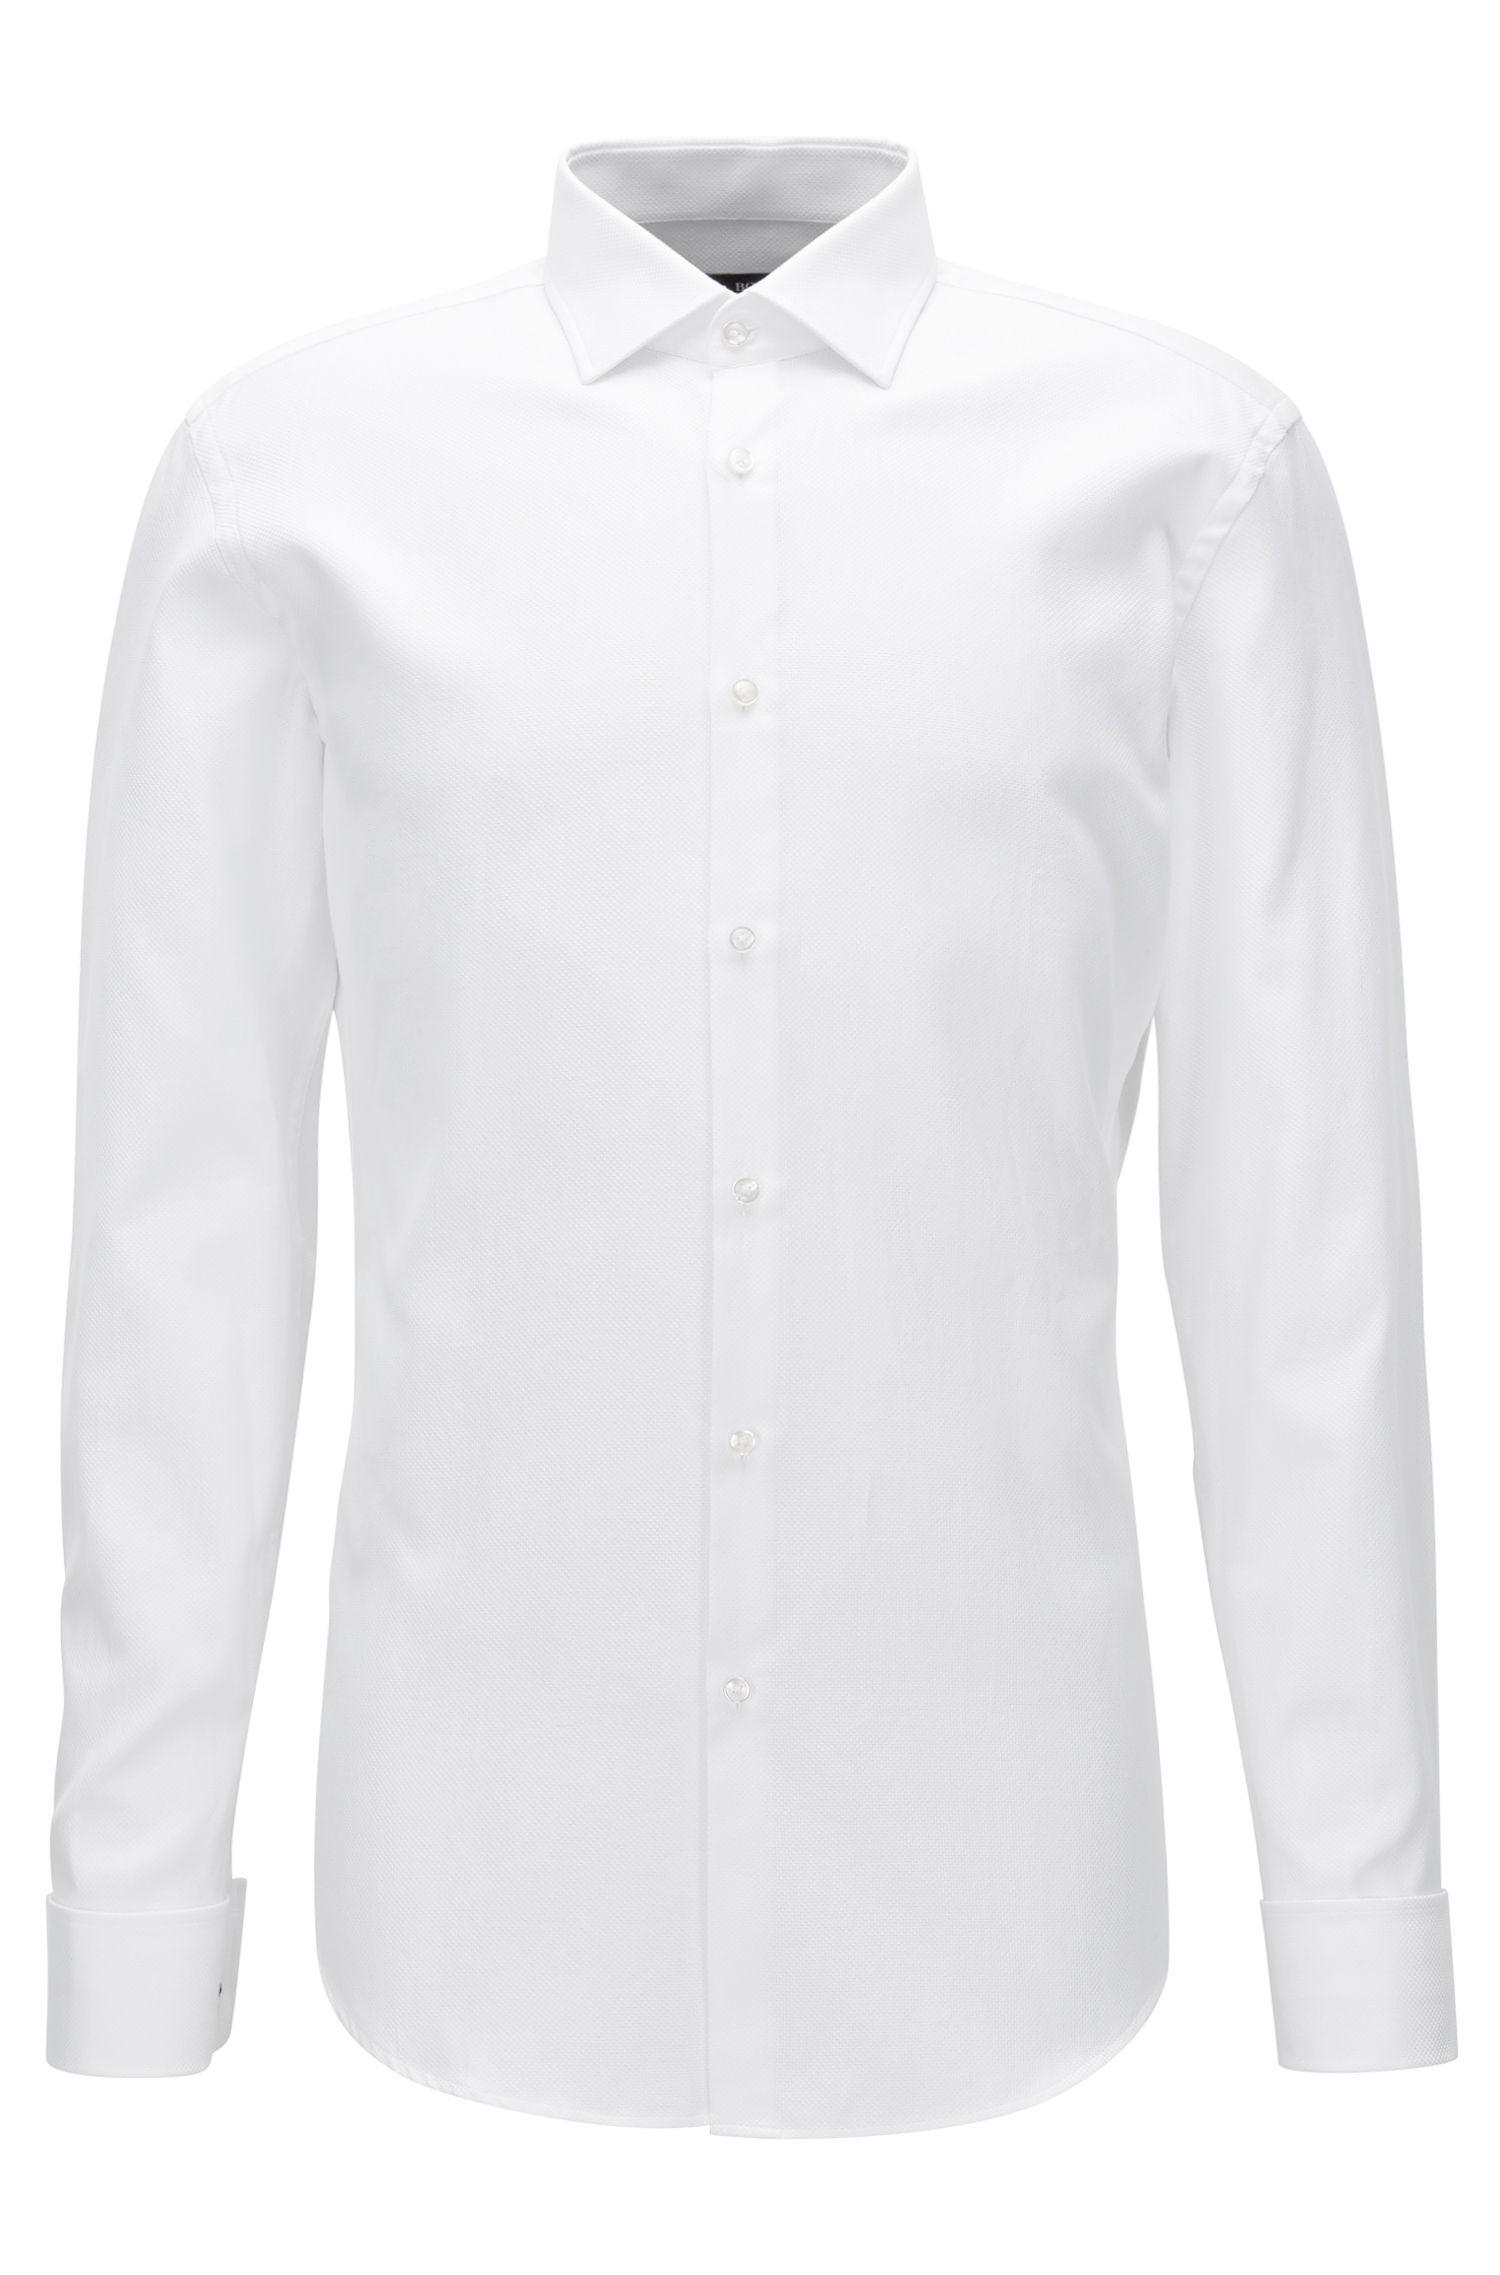 'Jacques' | Slim Fit, Geometric French Cuff Cotton Dress Shirt